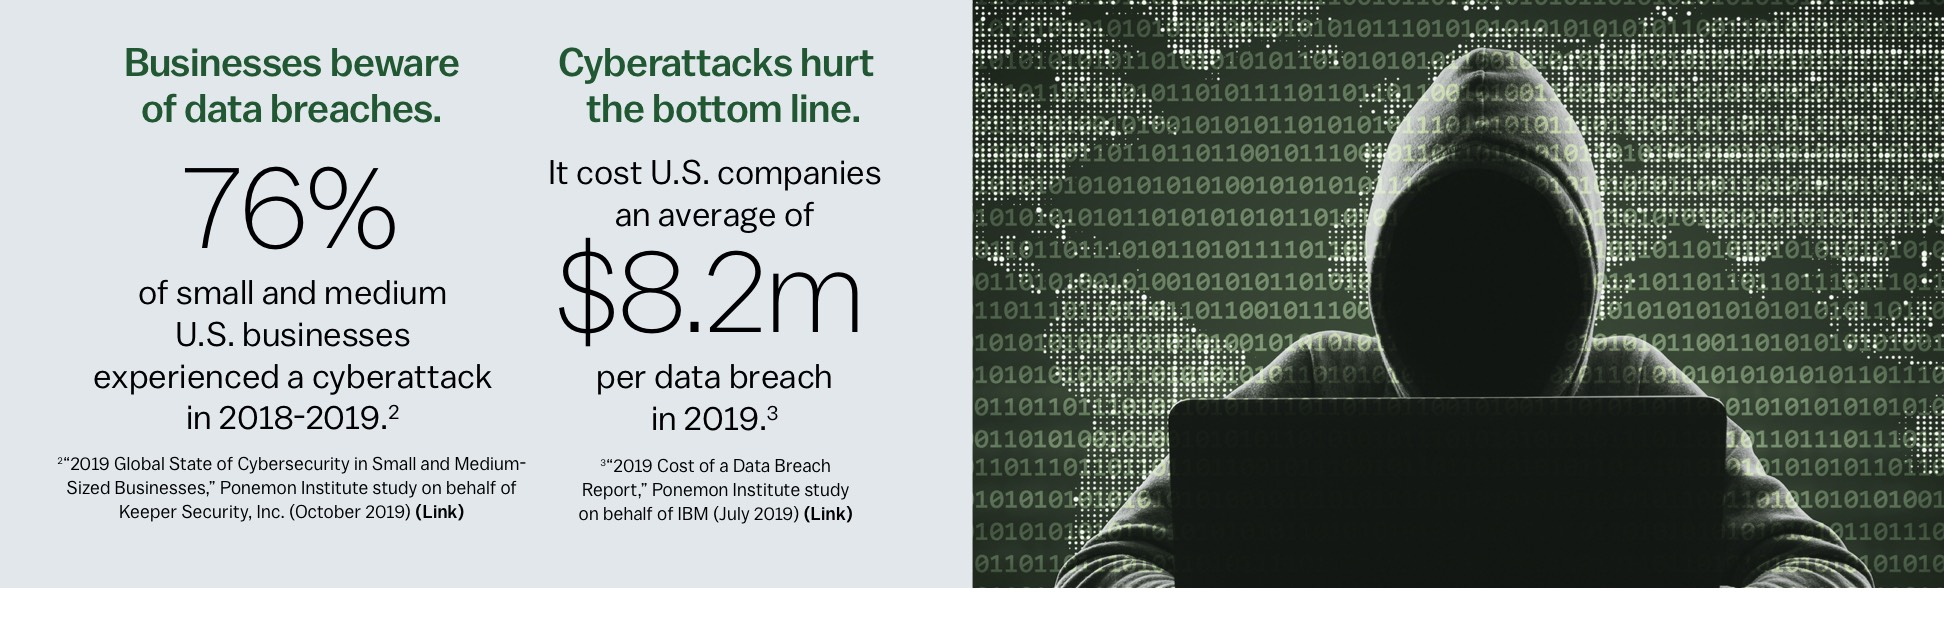 cybersecurity-info-graphic-hero.jpg